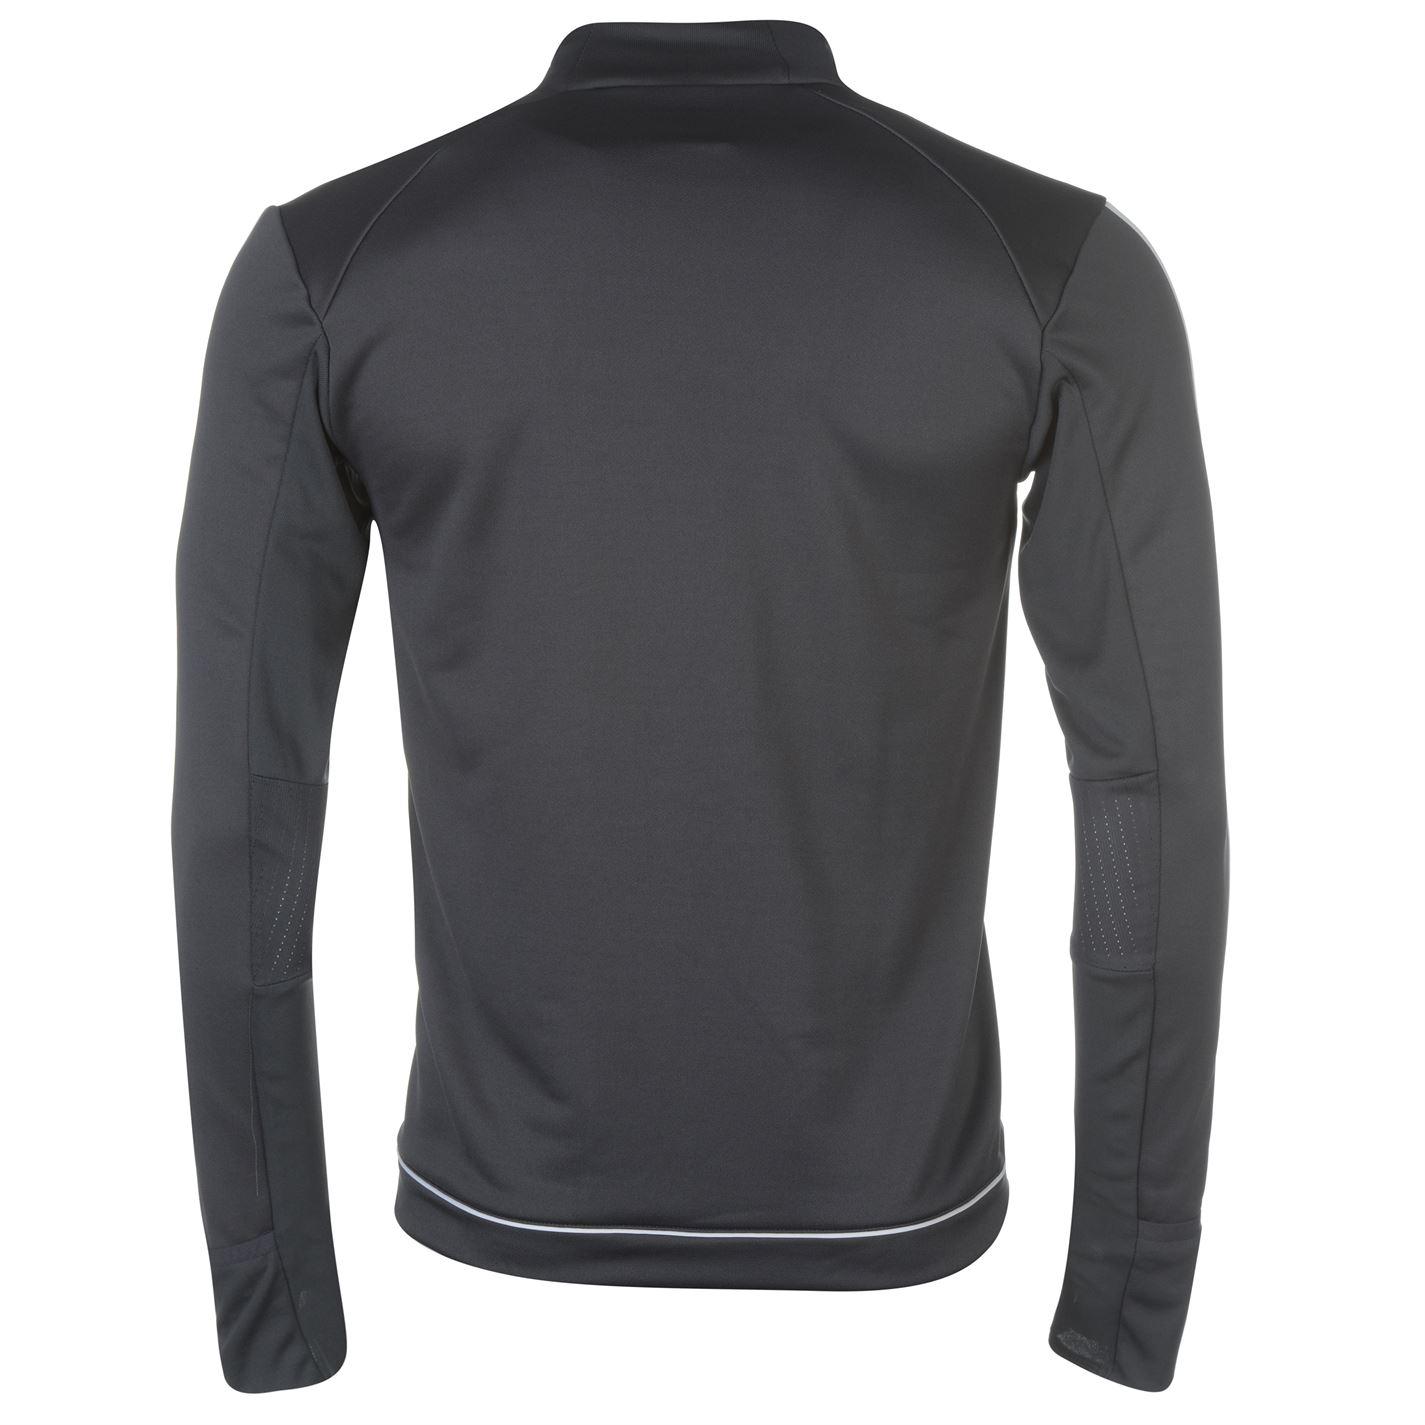 Adidas Mens Gents Manchester United Training Training Training Shirt Top Sports Clothing | Ich kann es nicht ablegen  a80652